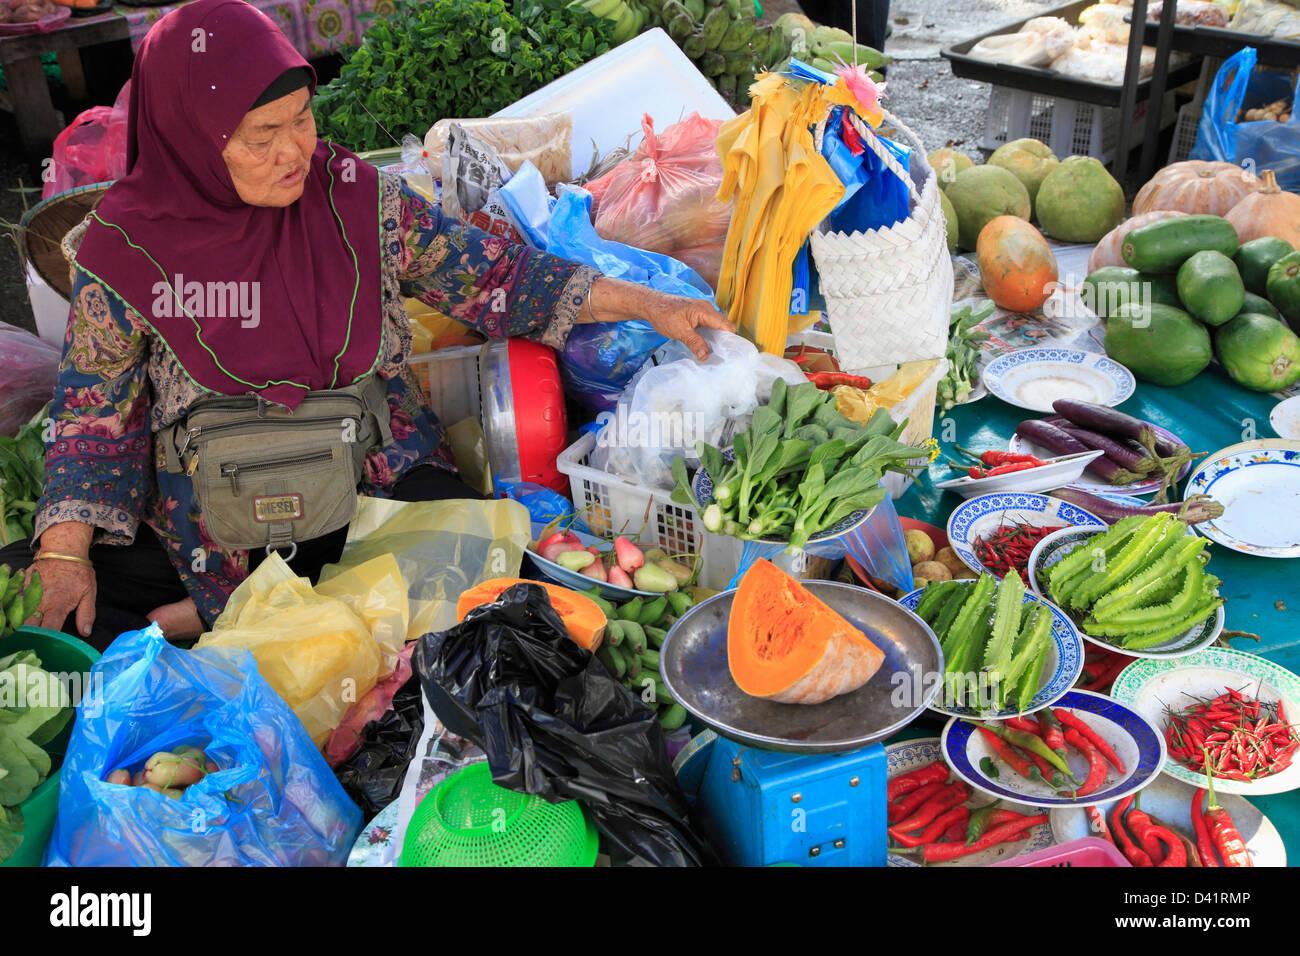 Brunei, Bandar Seri Begawan, Tamu Kianggeh, market, - Stock Image